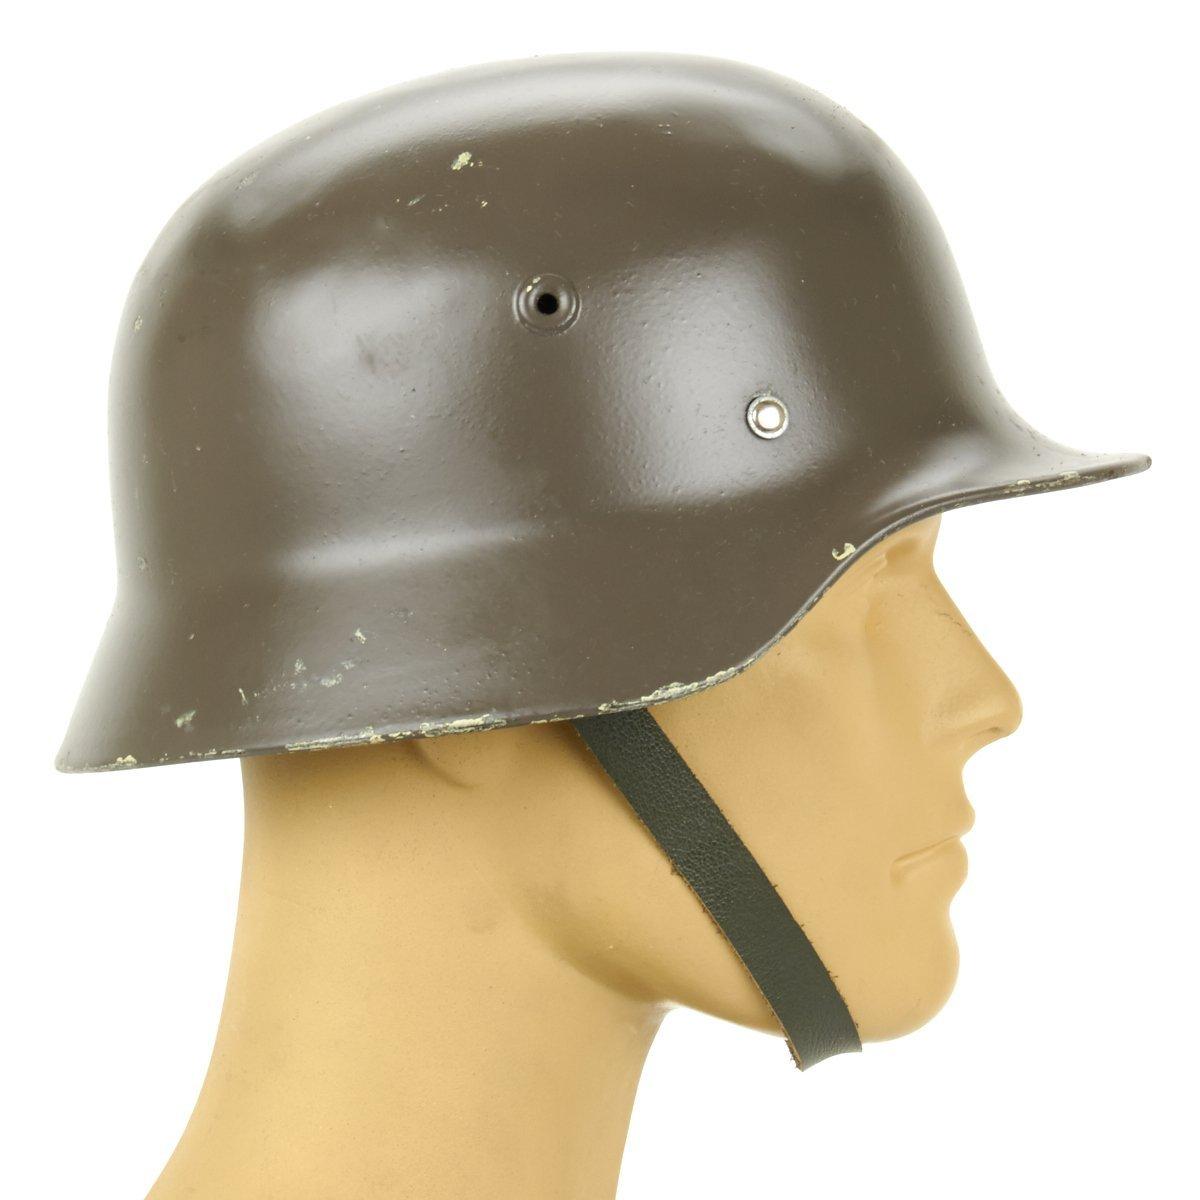 War helmet ww2 clipart black and white library German WW2 Helmets and Hats – International Military Antiques black and white library